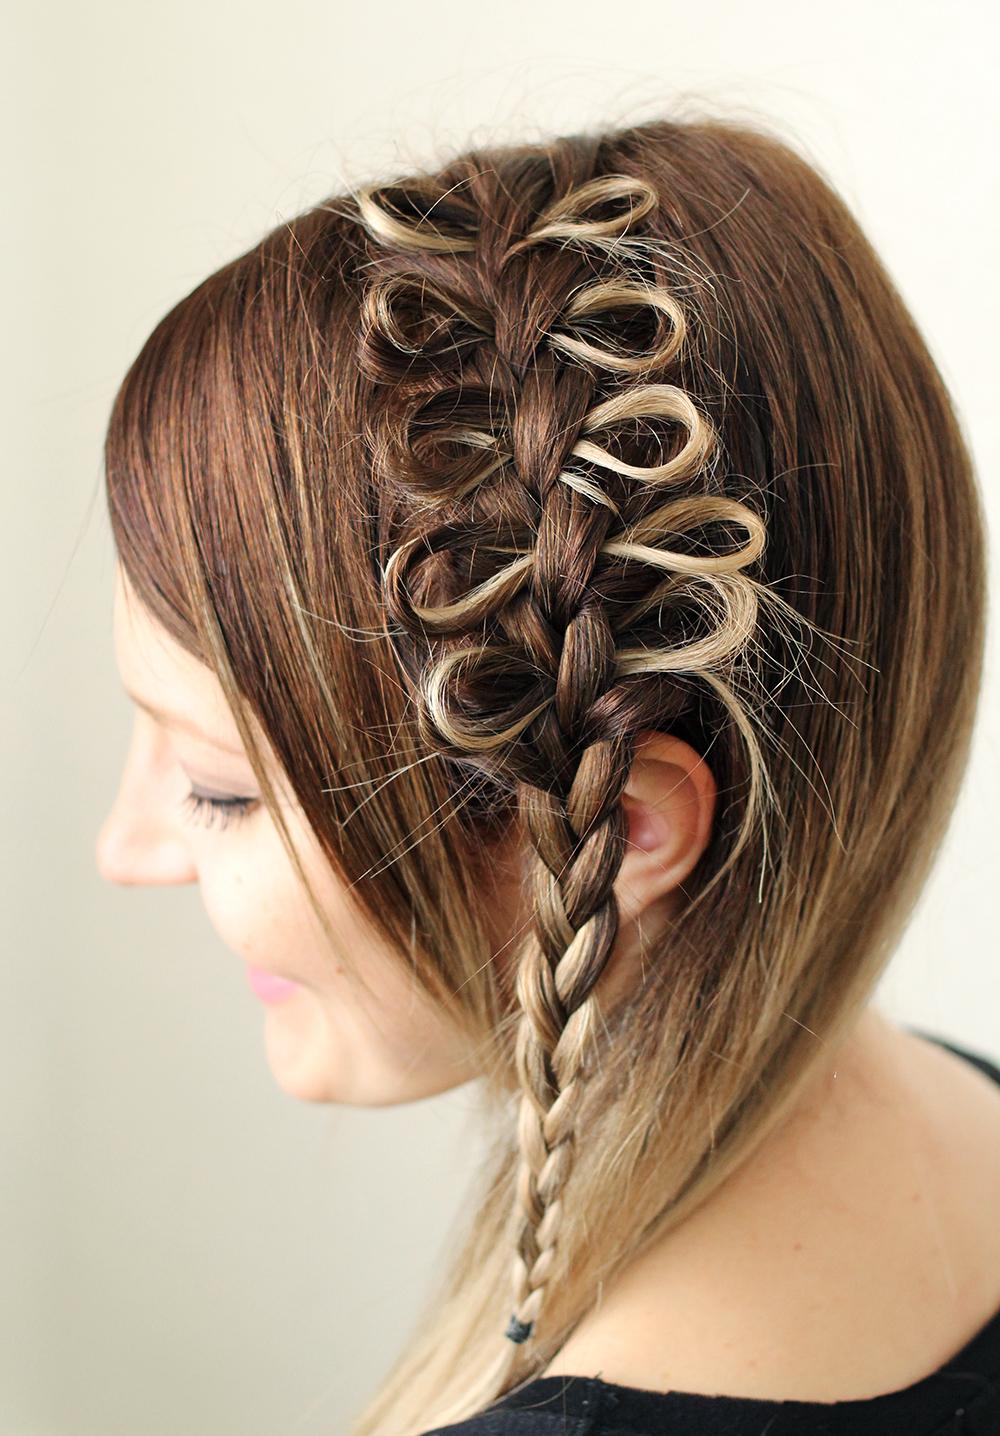 Exclusivo bonito meninas penteado arco trança